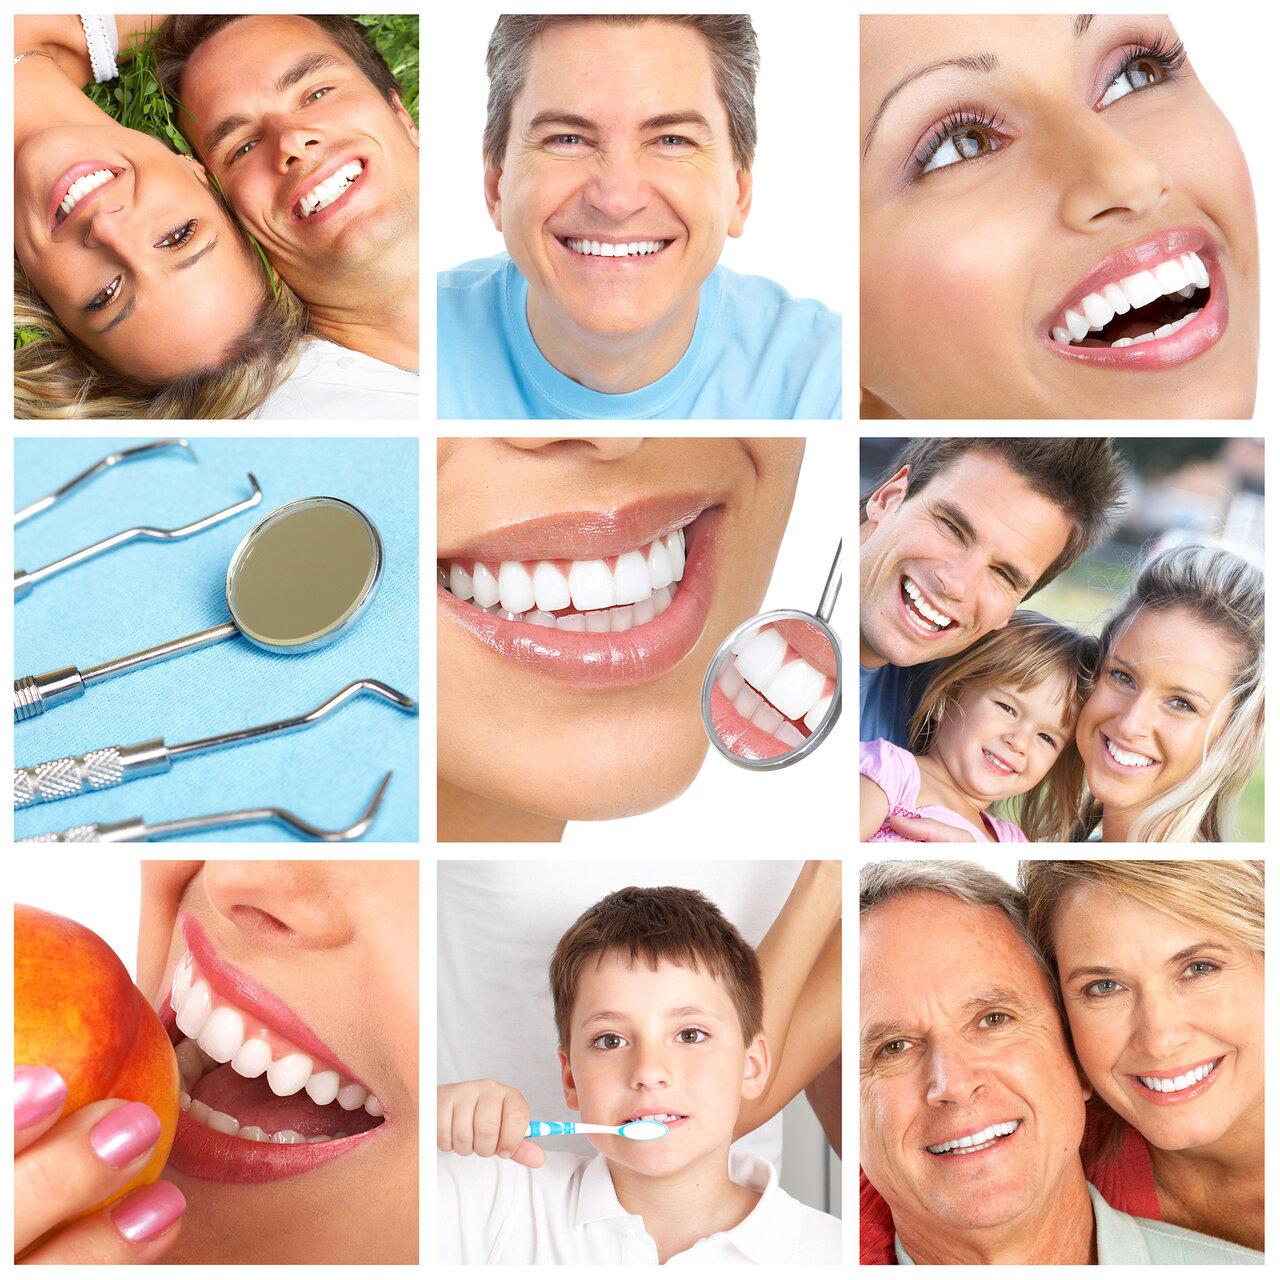 Картинки на тему здоровая улыбка